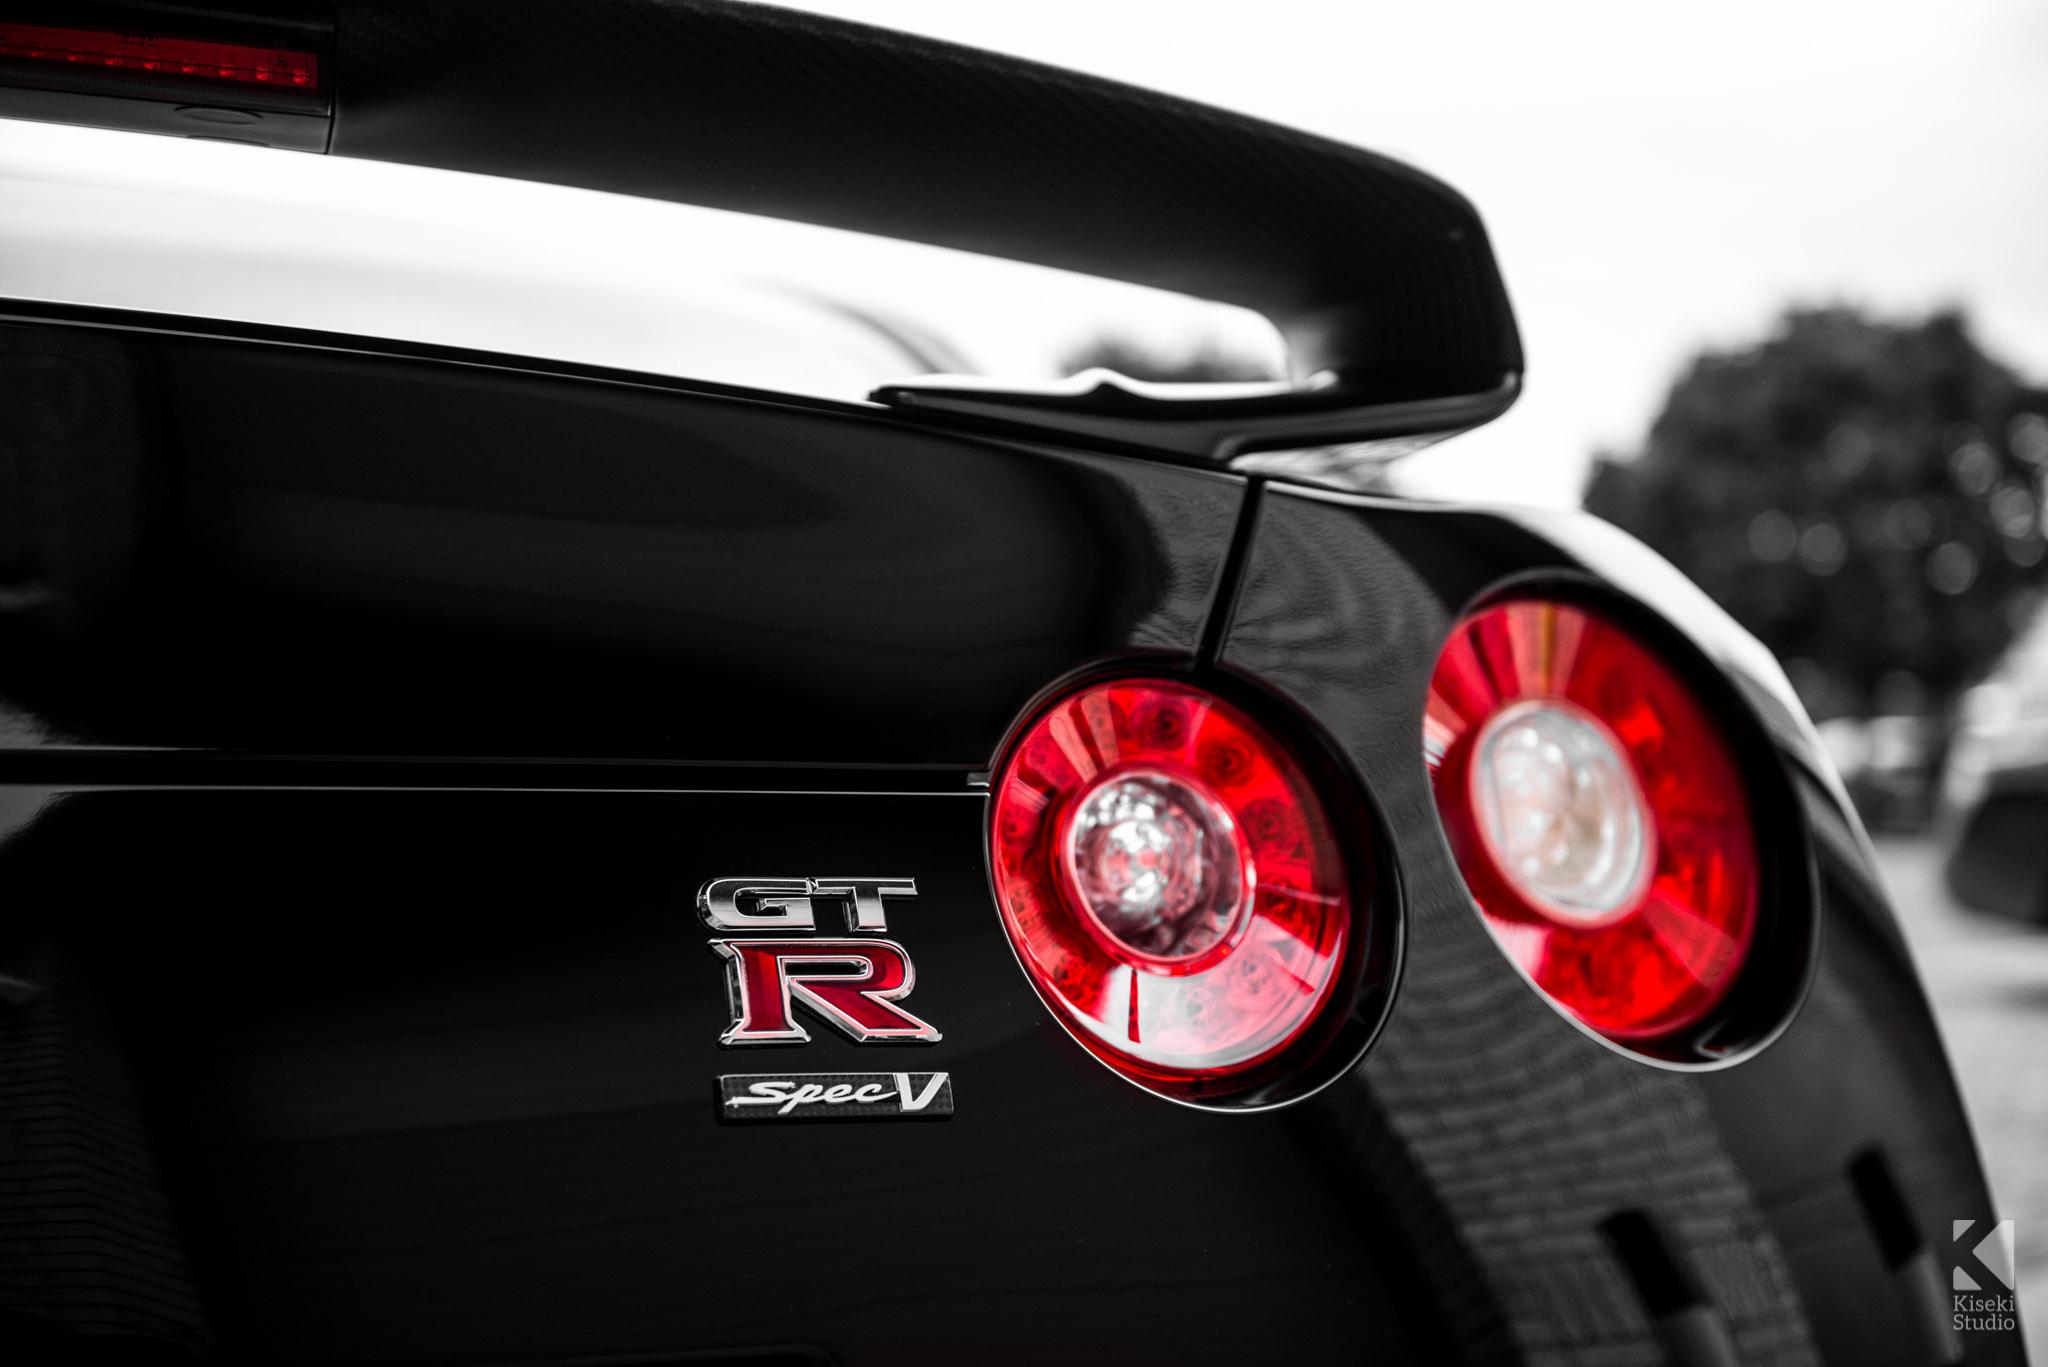 Nissan Gt R Spec V R35 Kiseki Studio Performance Specs Rear Lights And Badge Detail